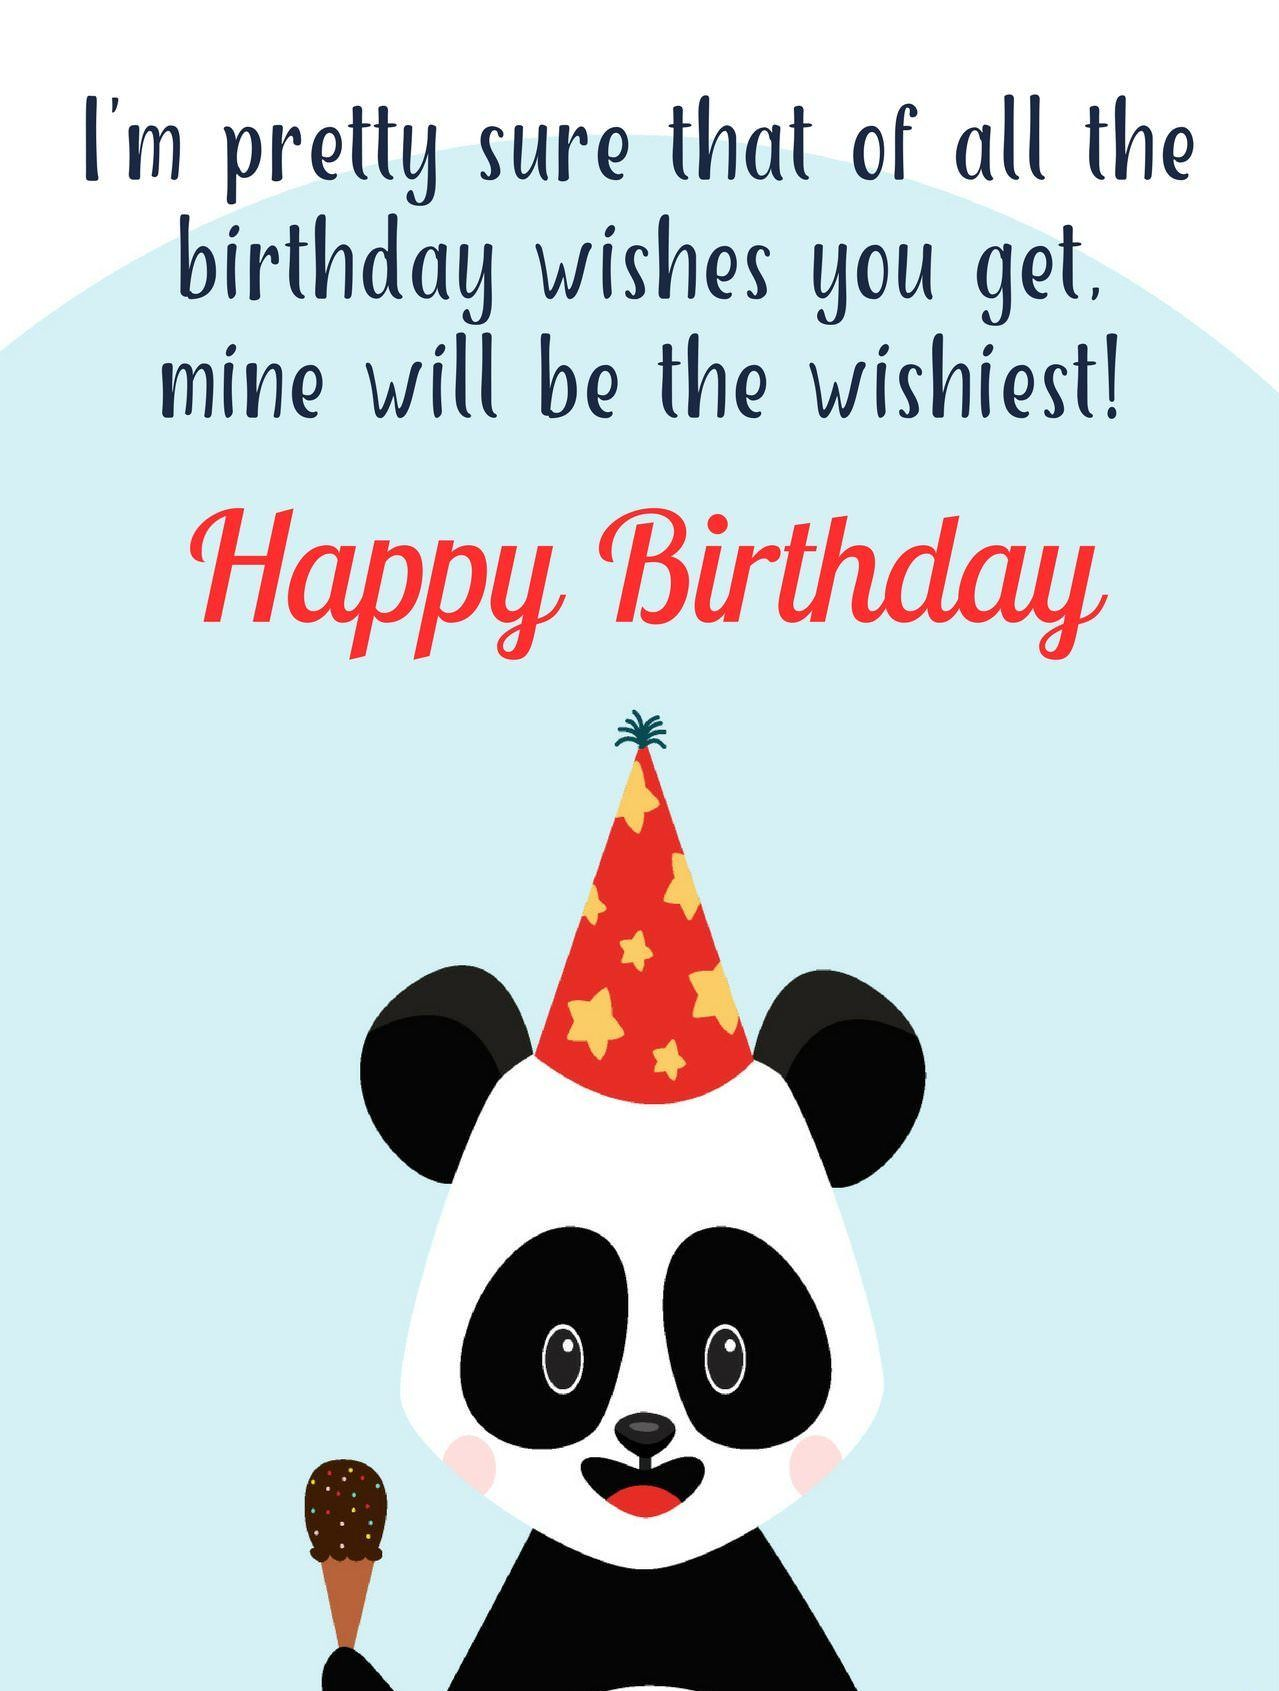 happy birthday peace Google Search … Birthday wishes